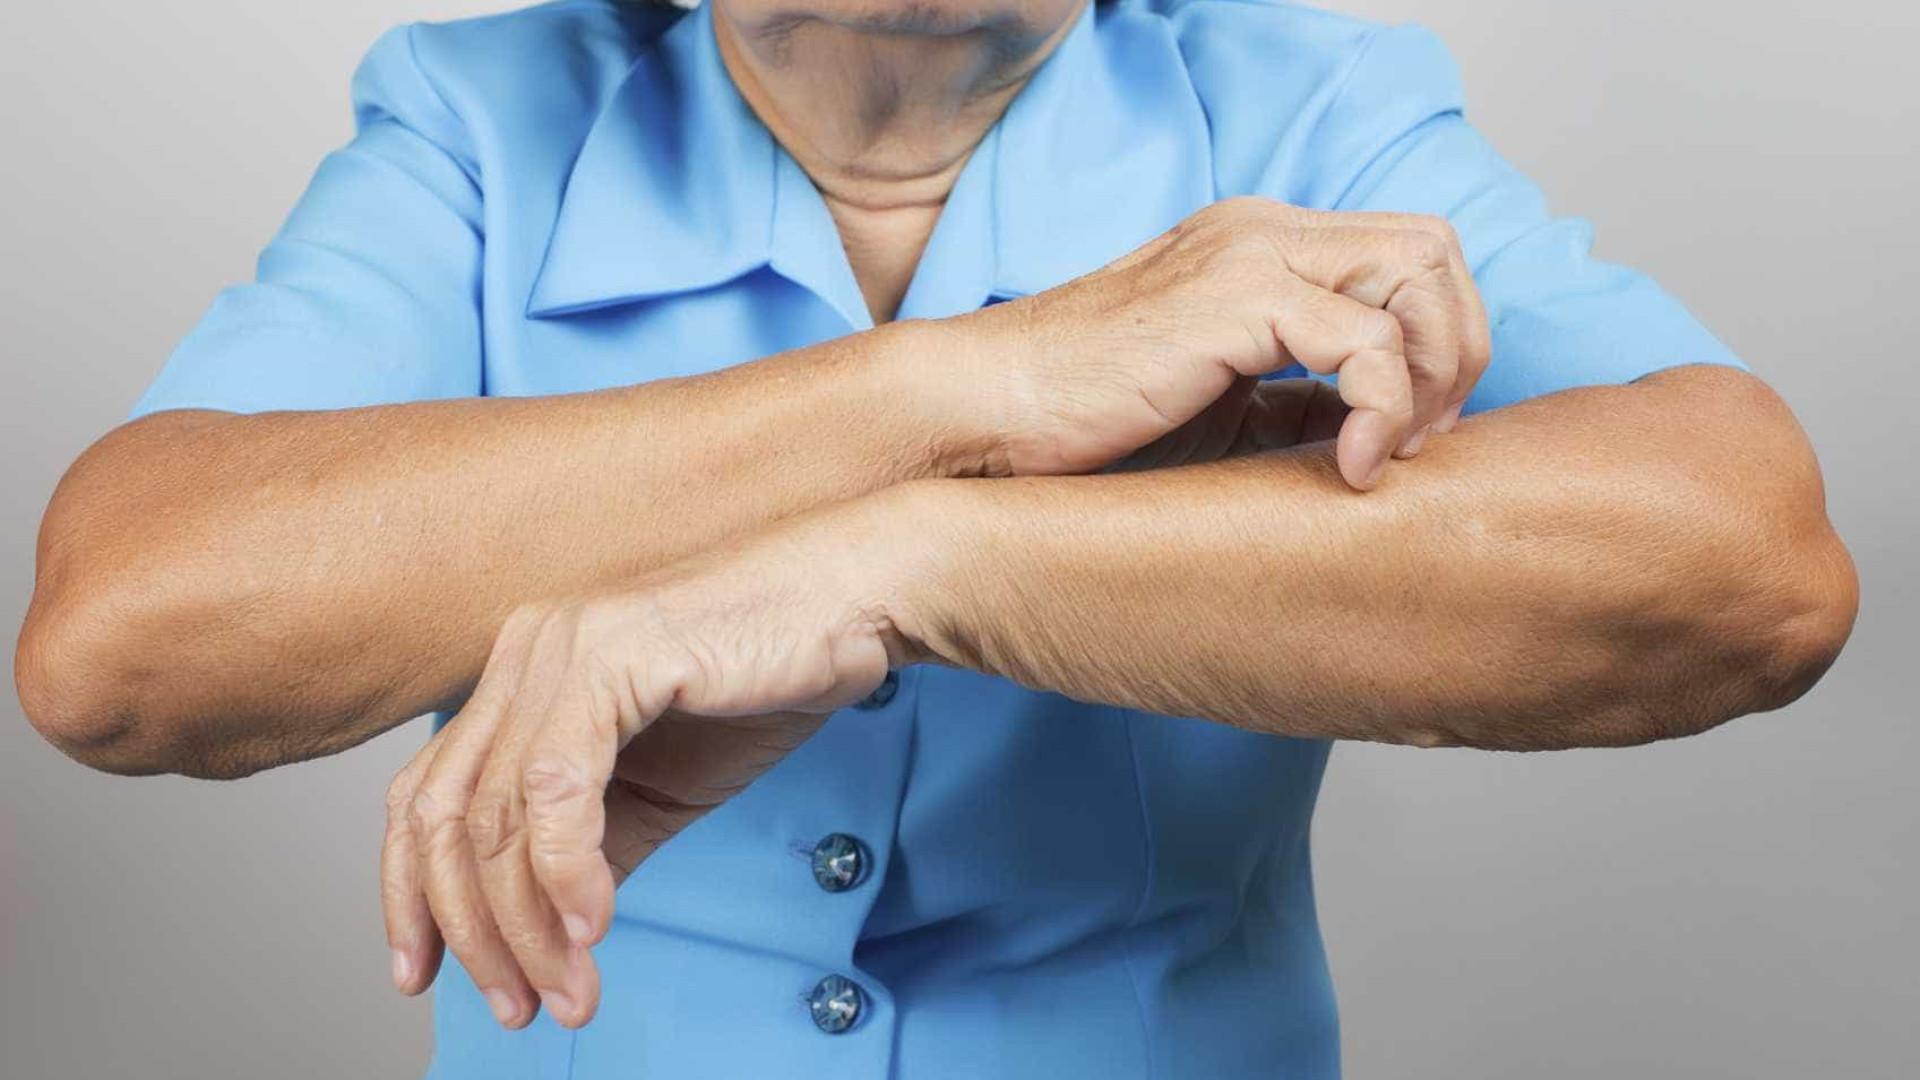 Psoríase: entenda a doença que causa lesões descamativas na pele